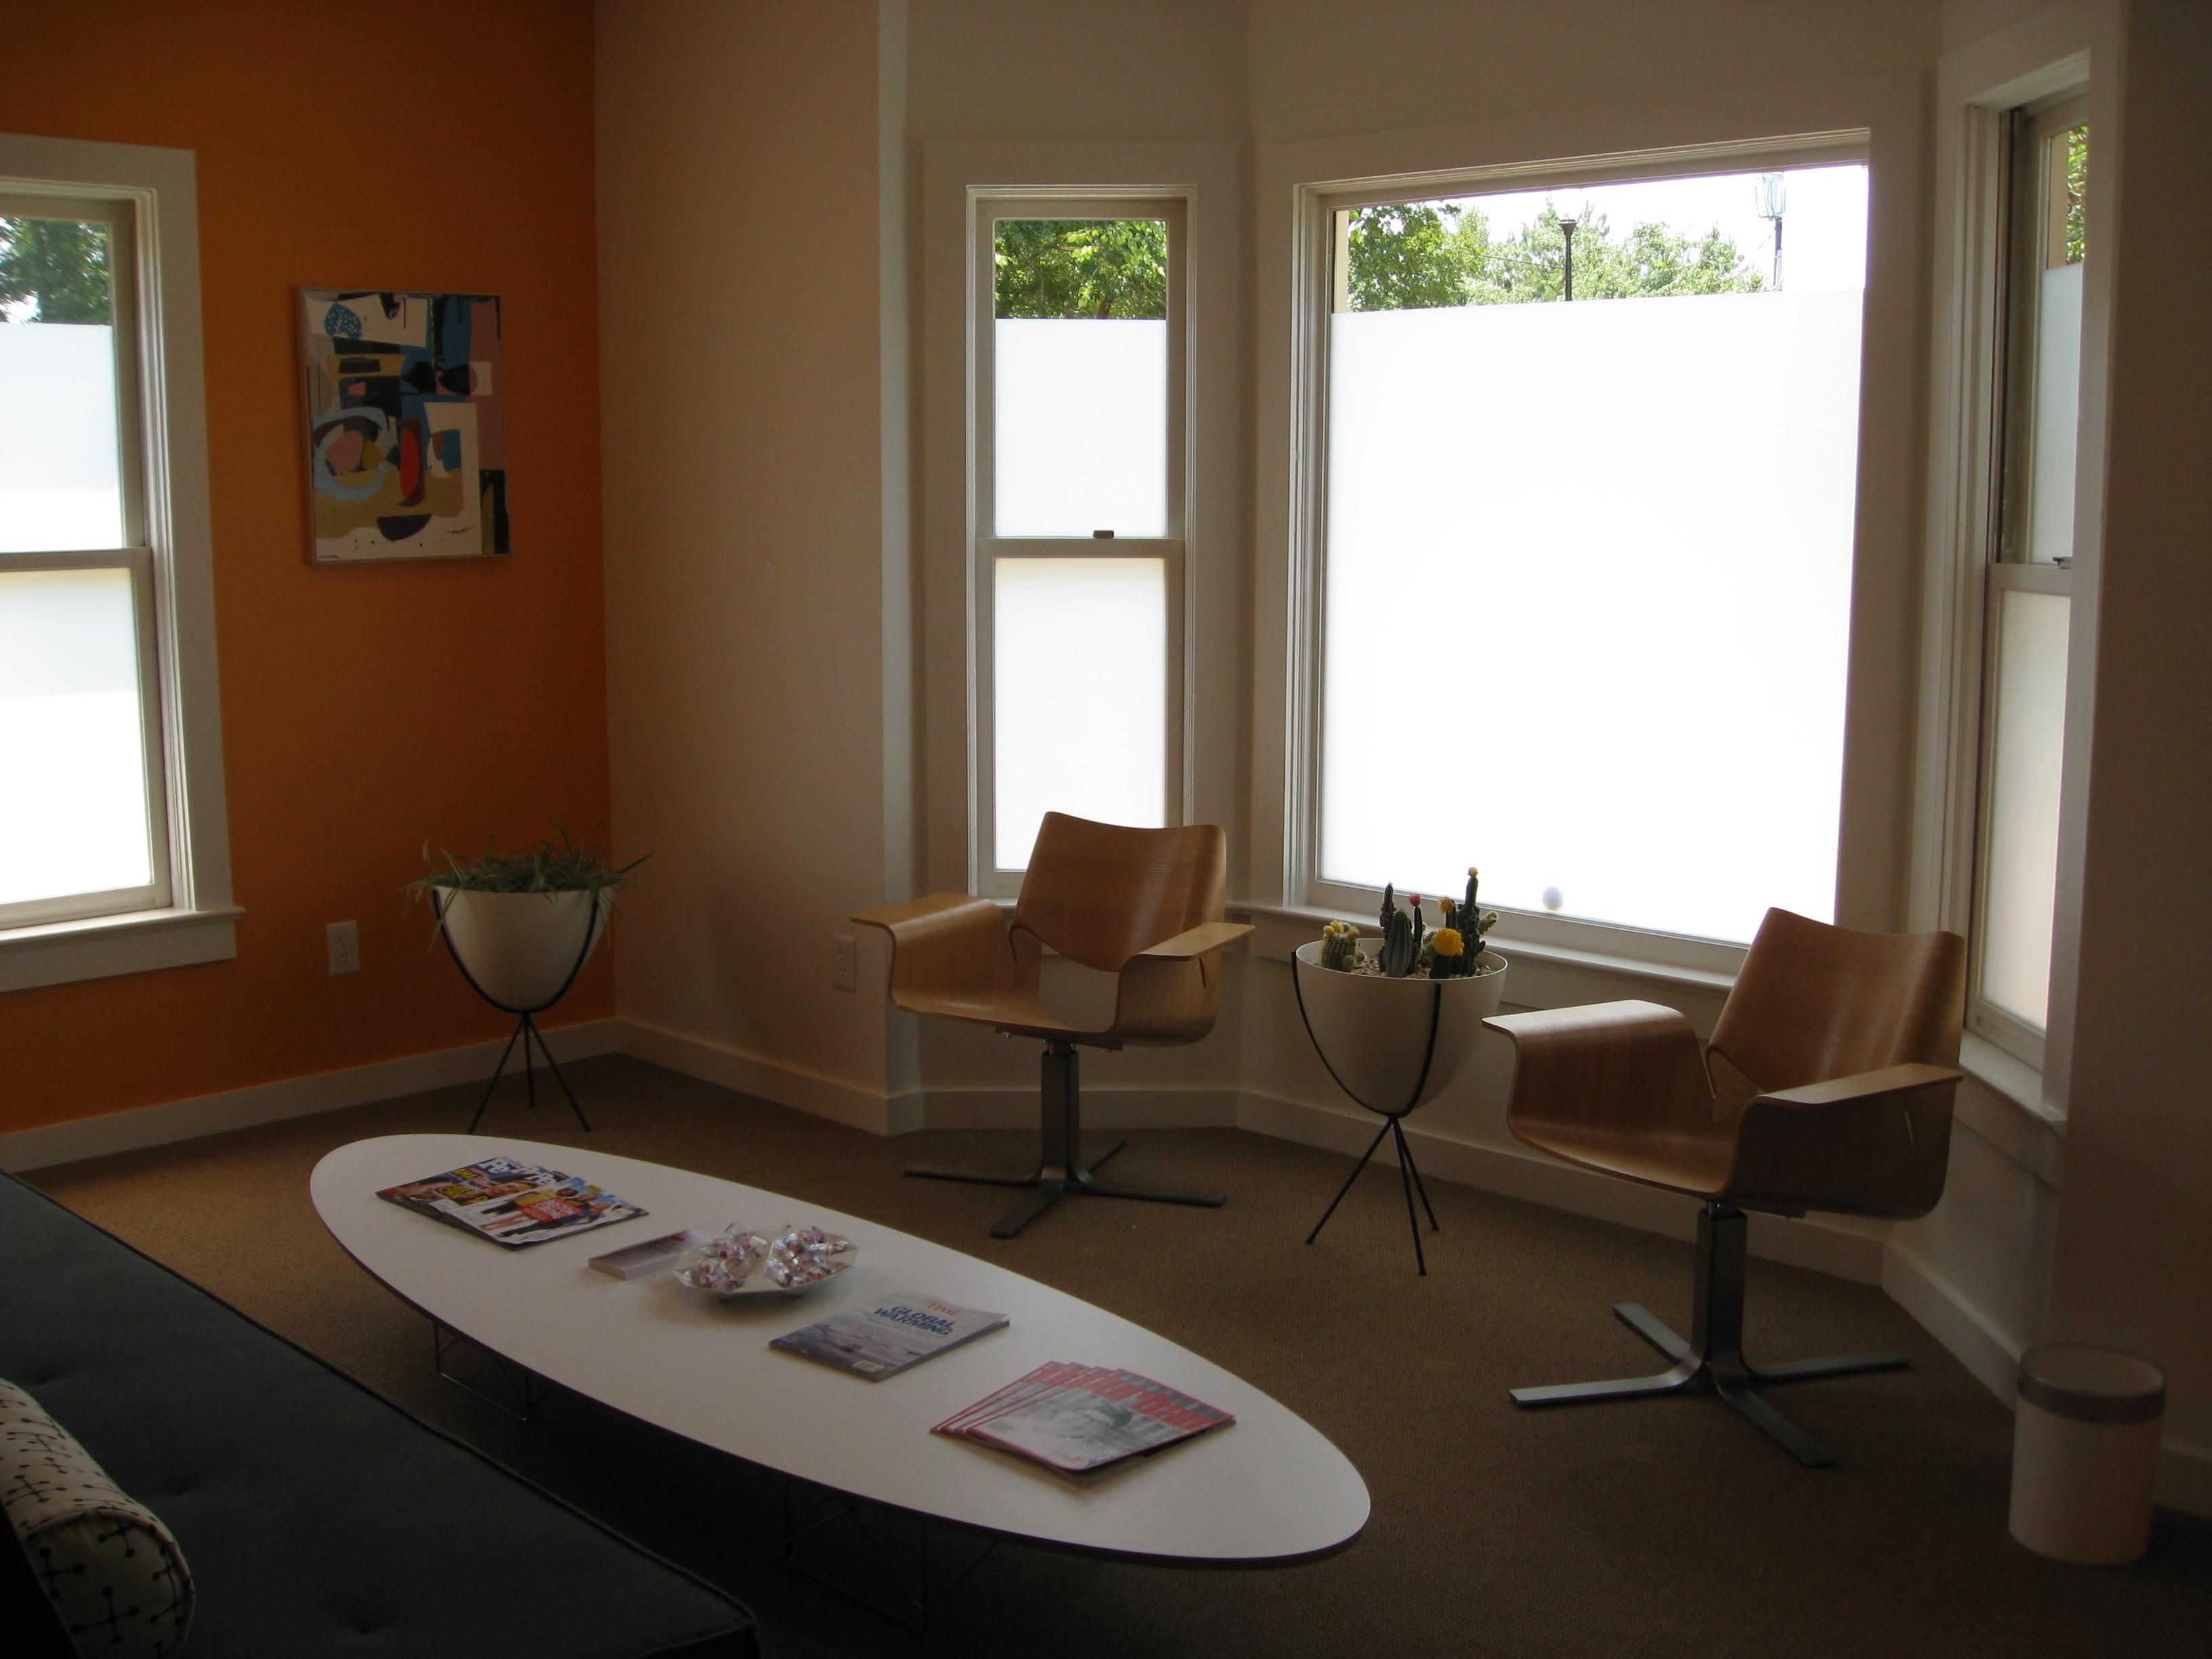 Kuhn Furniture